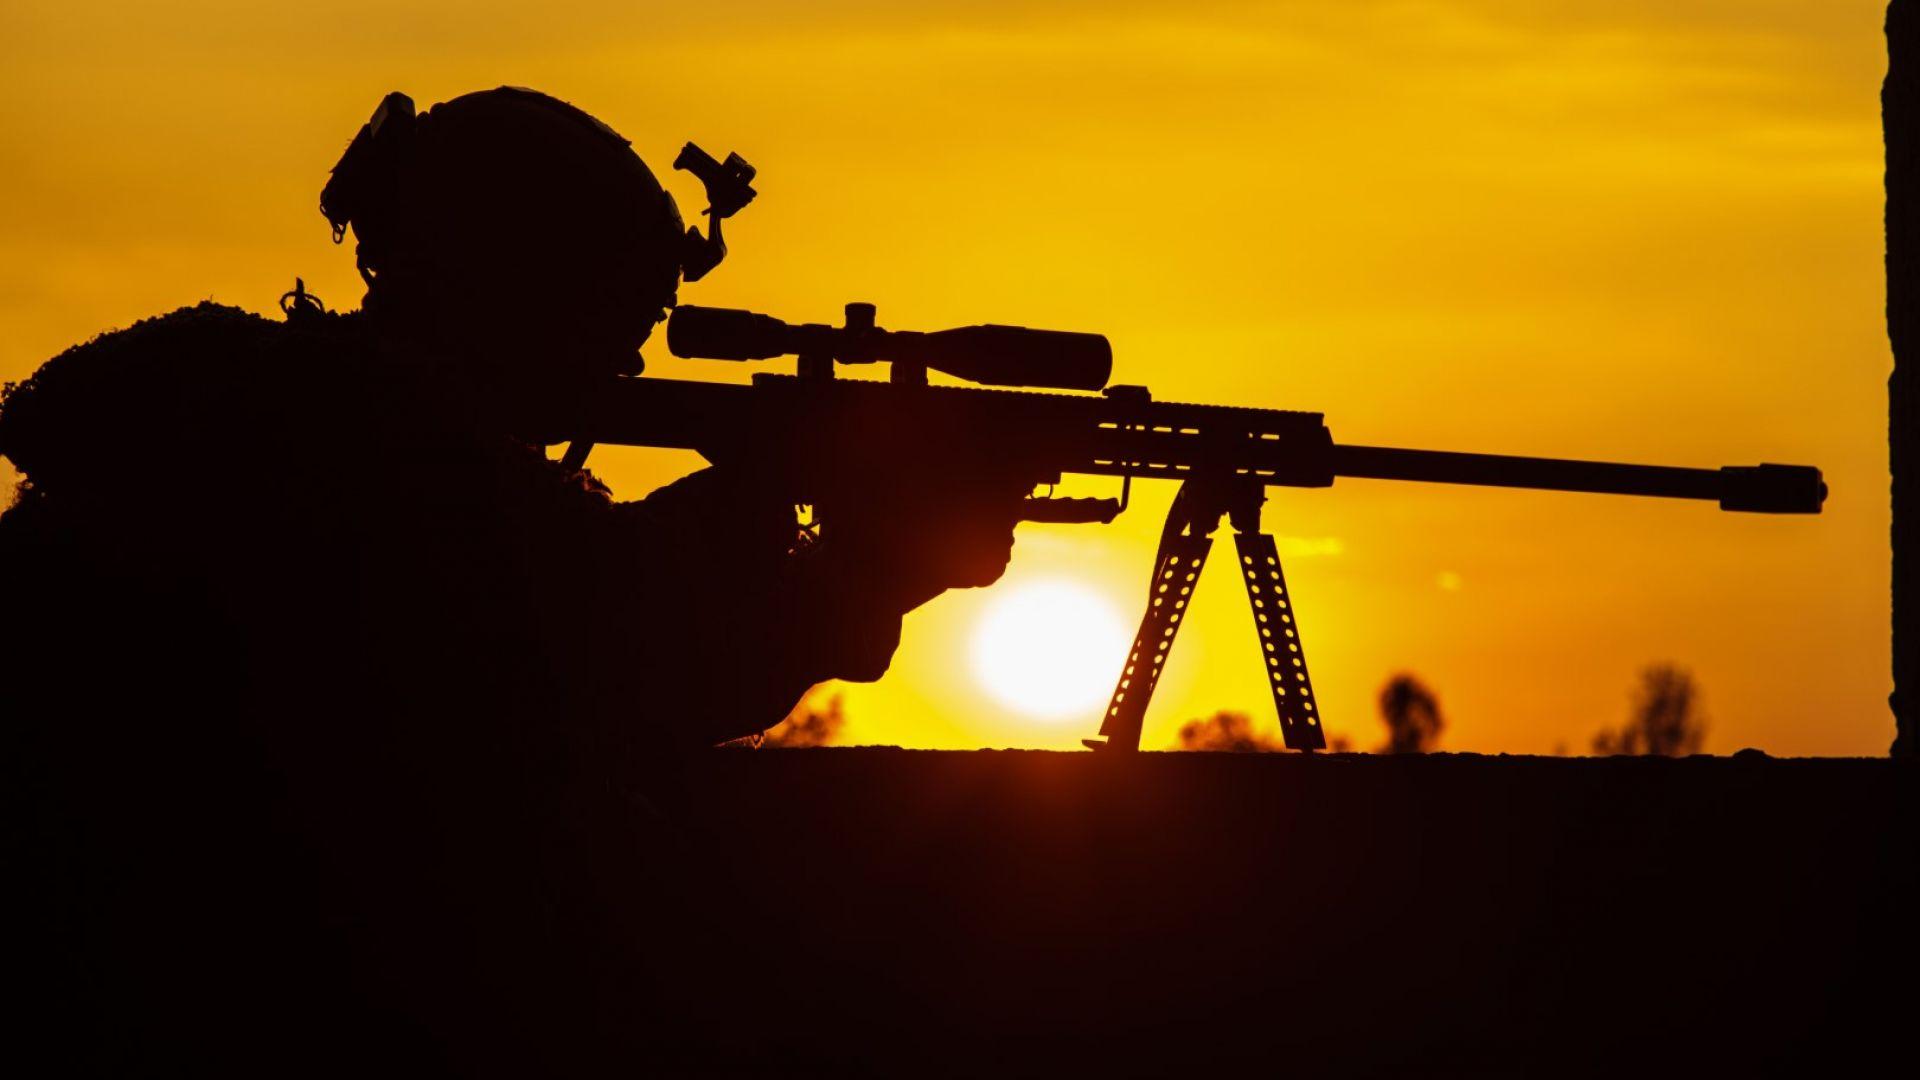 Албанци са главни снайперисти в Ан Нусра